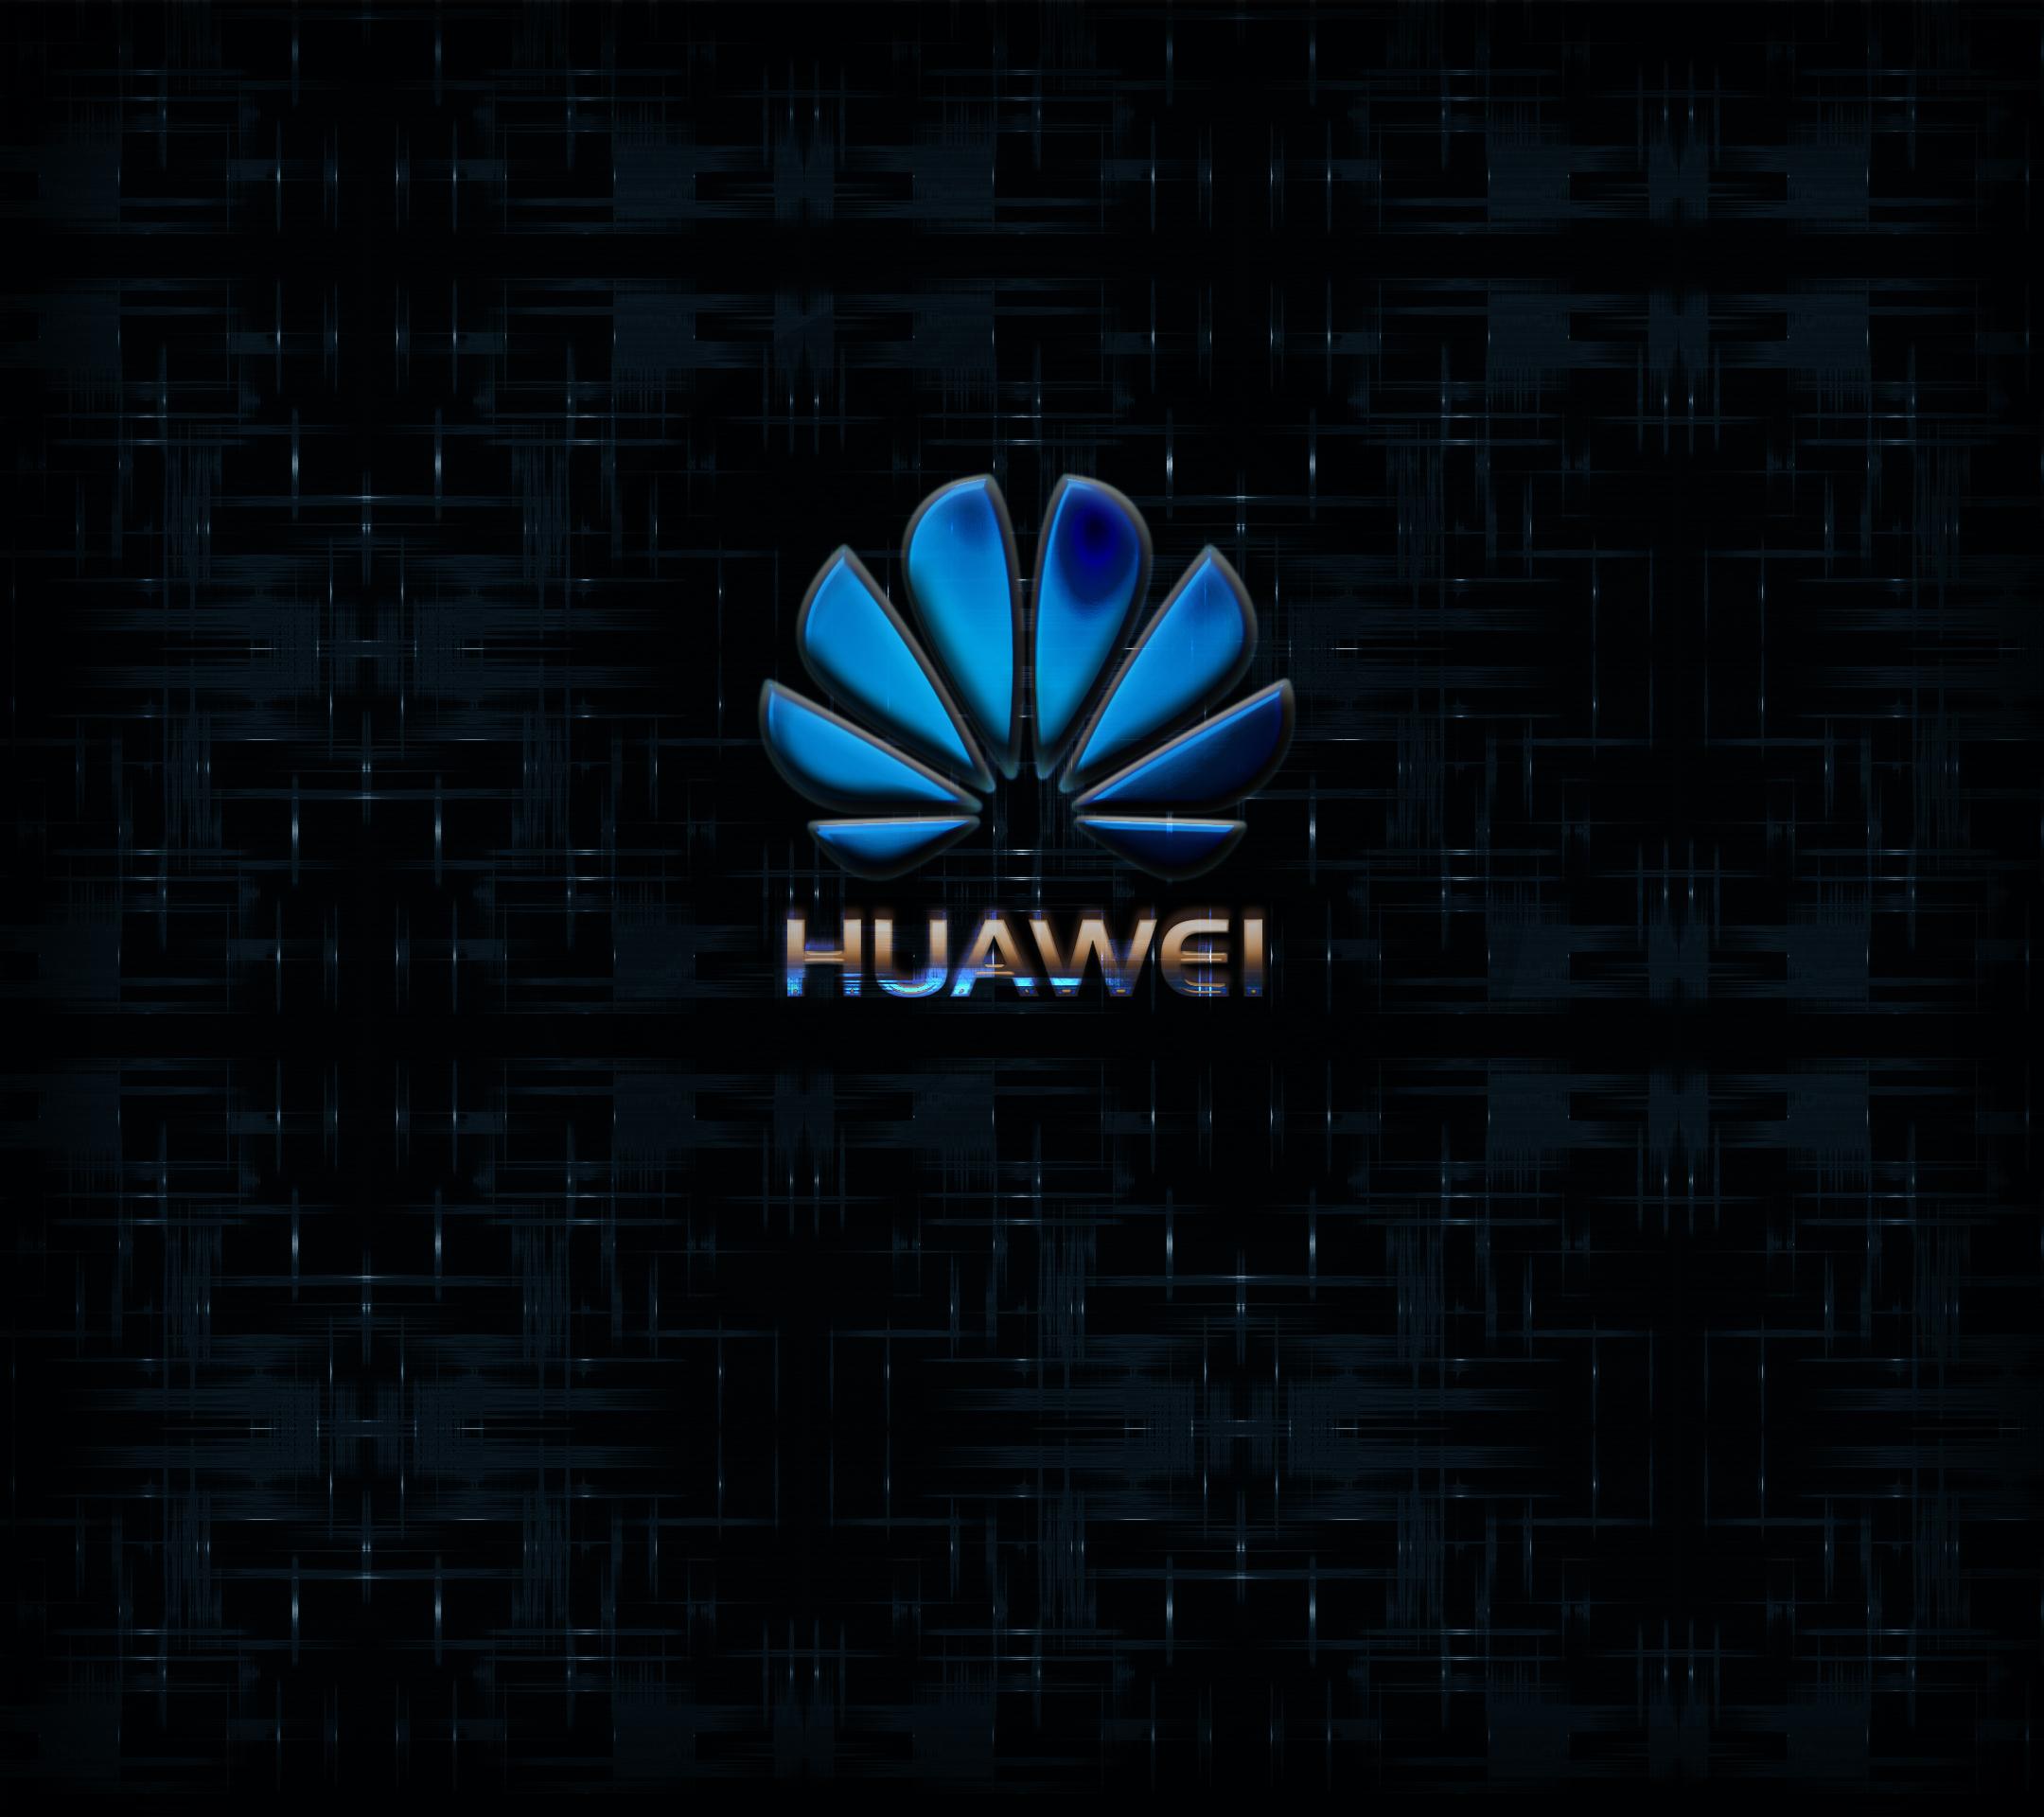 Simple Wallpaper Logo Huawei - huawei_wallpaper_001_by_leg_amk_end-d9sbct5  Graphic_676867.jpg